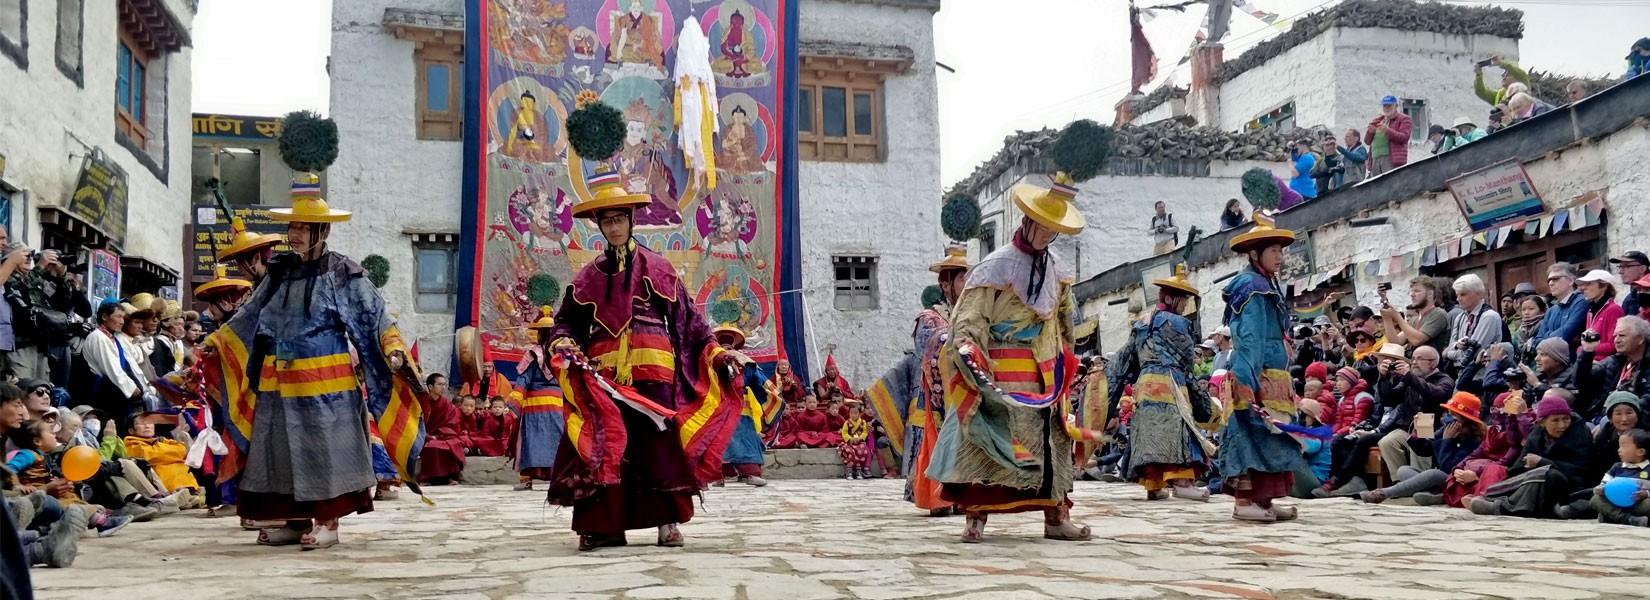 tiji-festival-upper-mustang-trek